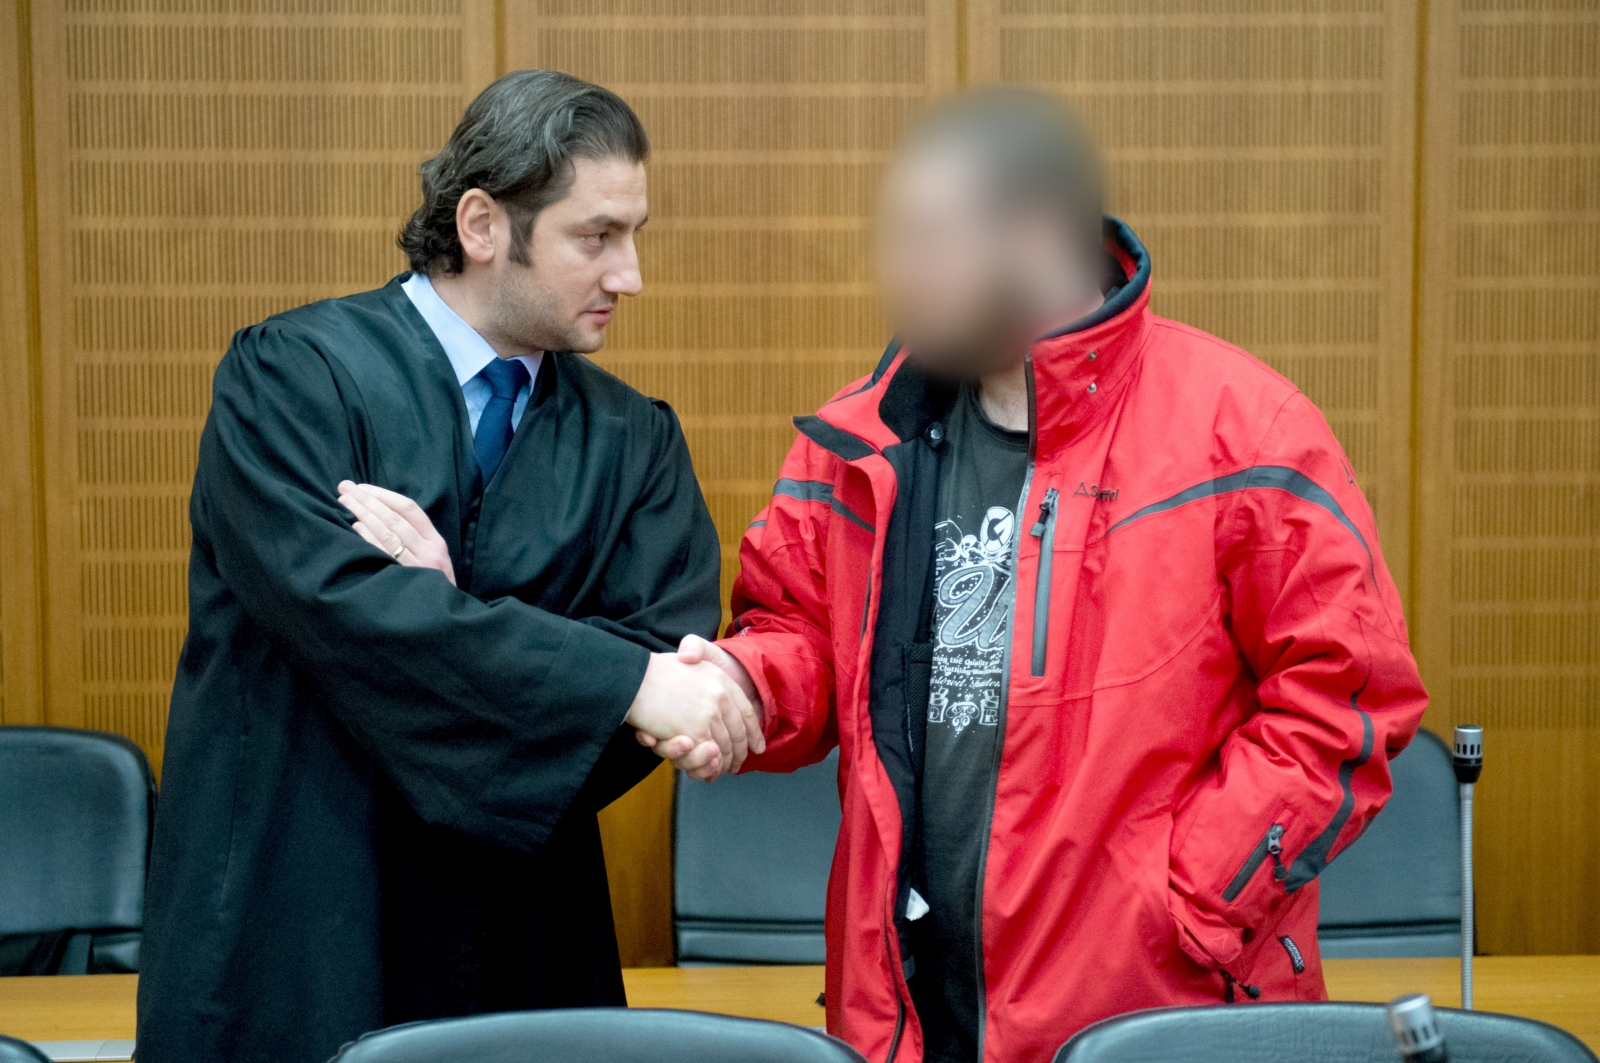 Kreshnik Berisha German Jihadi Jailed ISIS